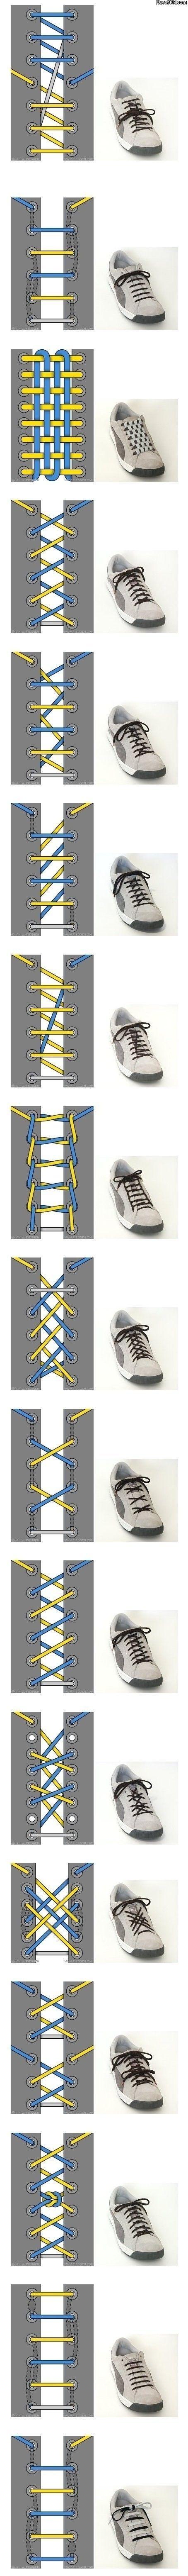 Hmmmmm. 17 ways to tie a shoelace